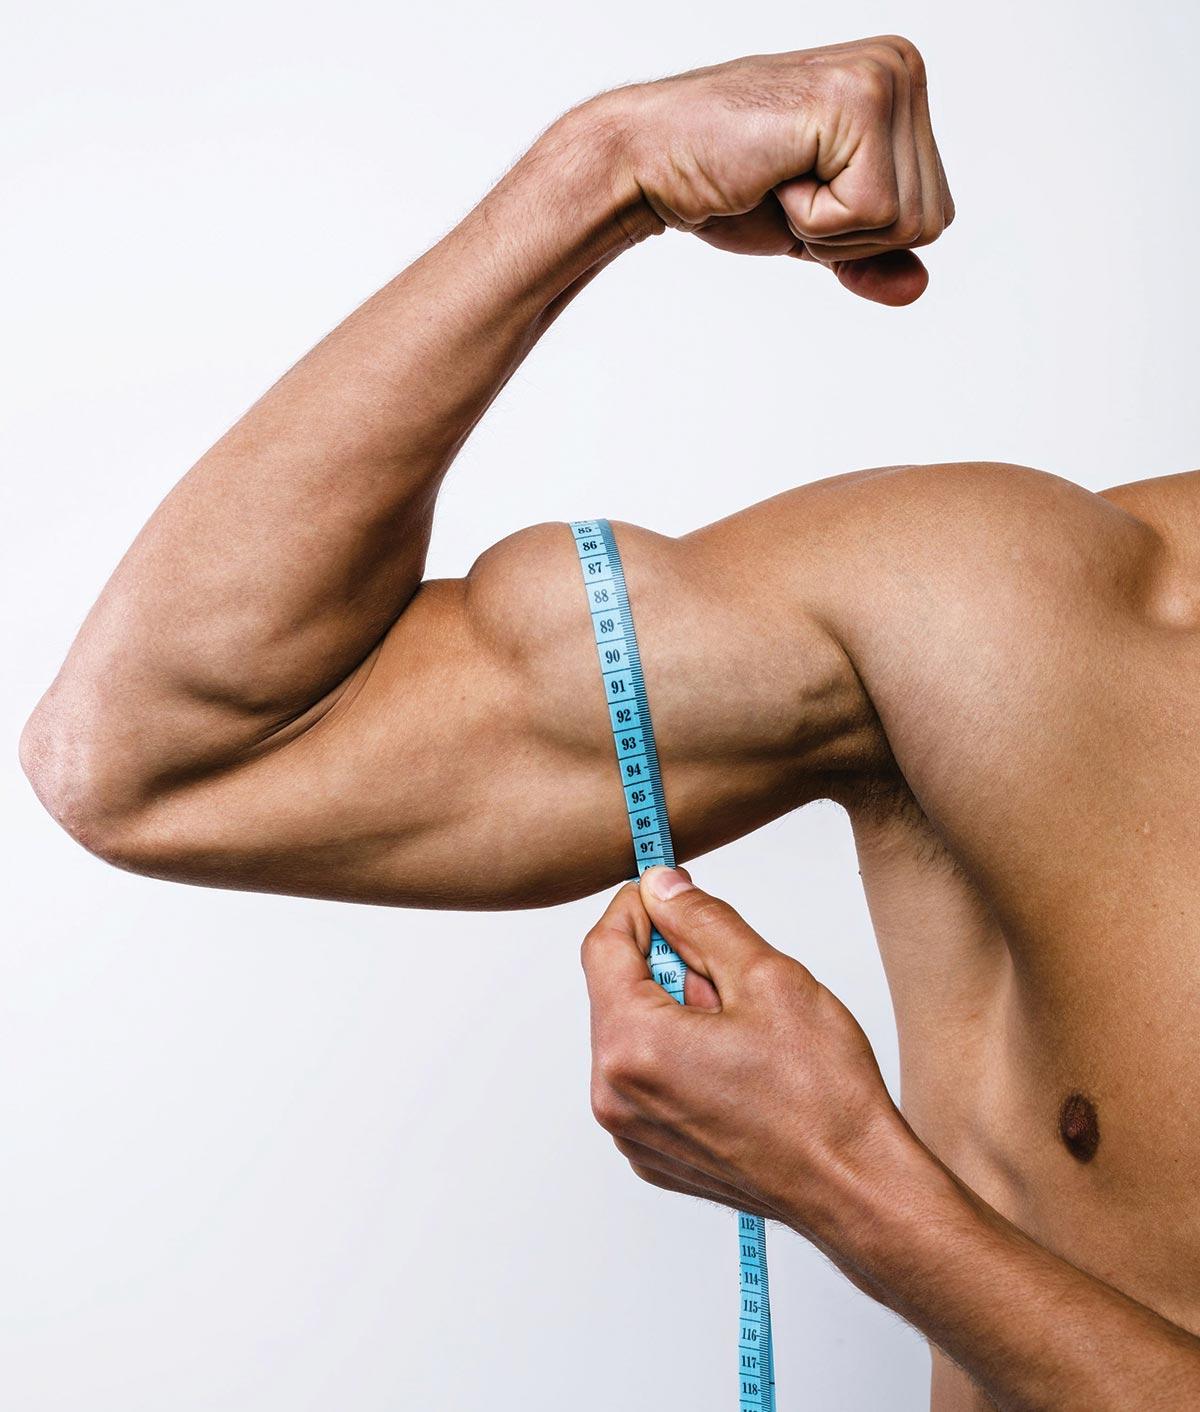 Testosteron pomanjkanje